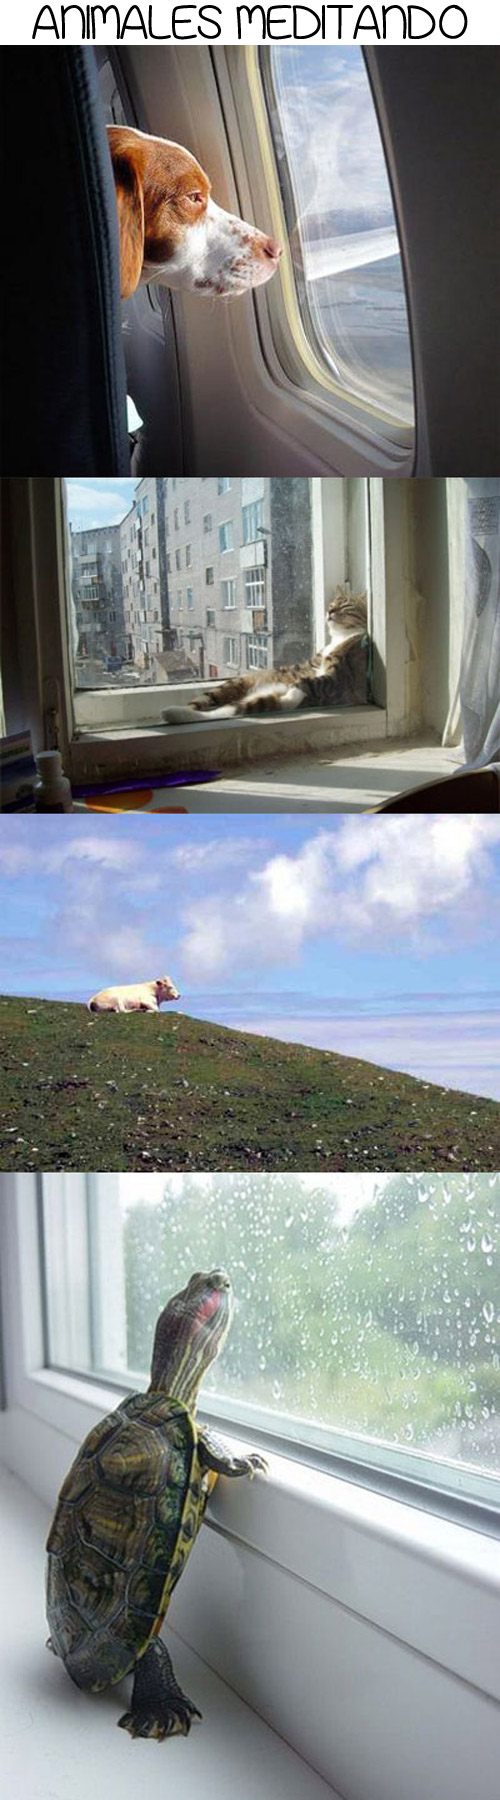 Animales meditando